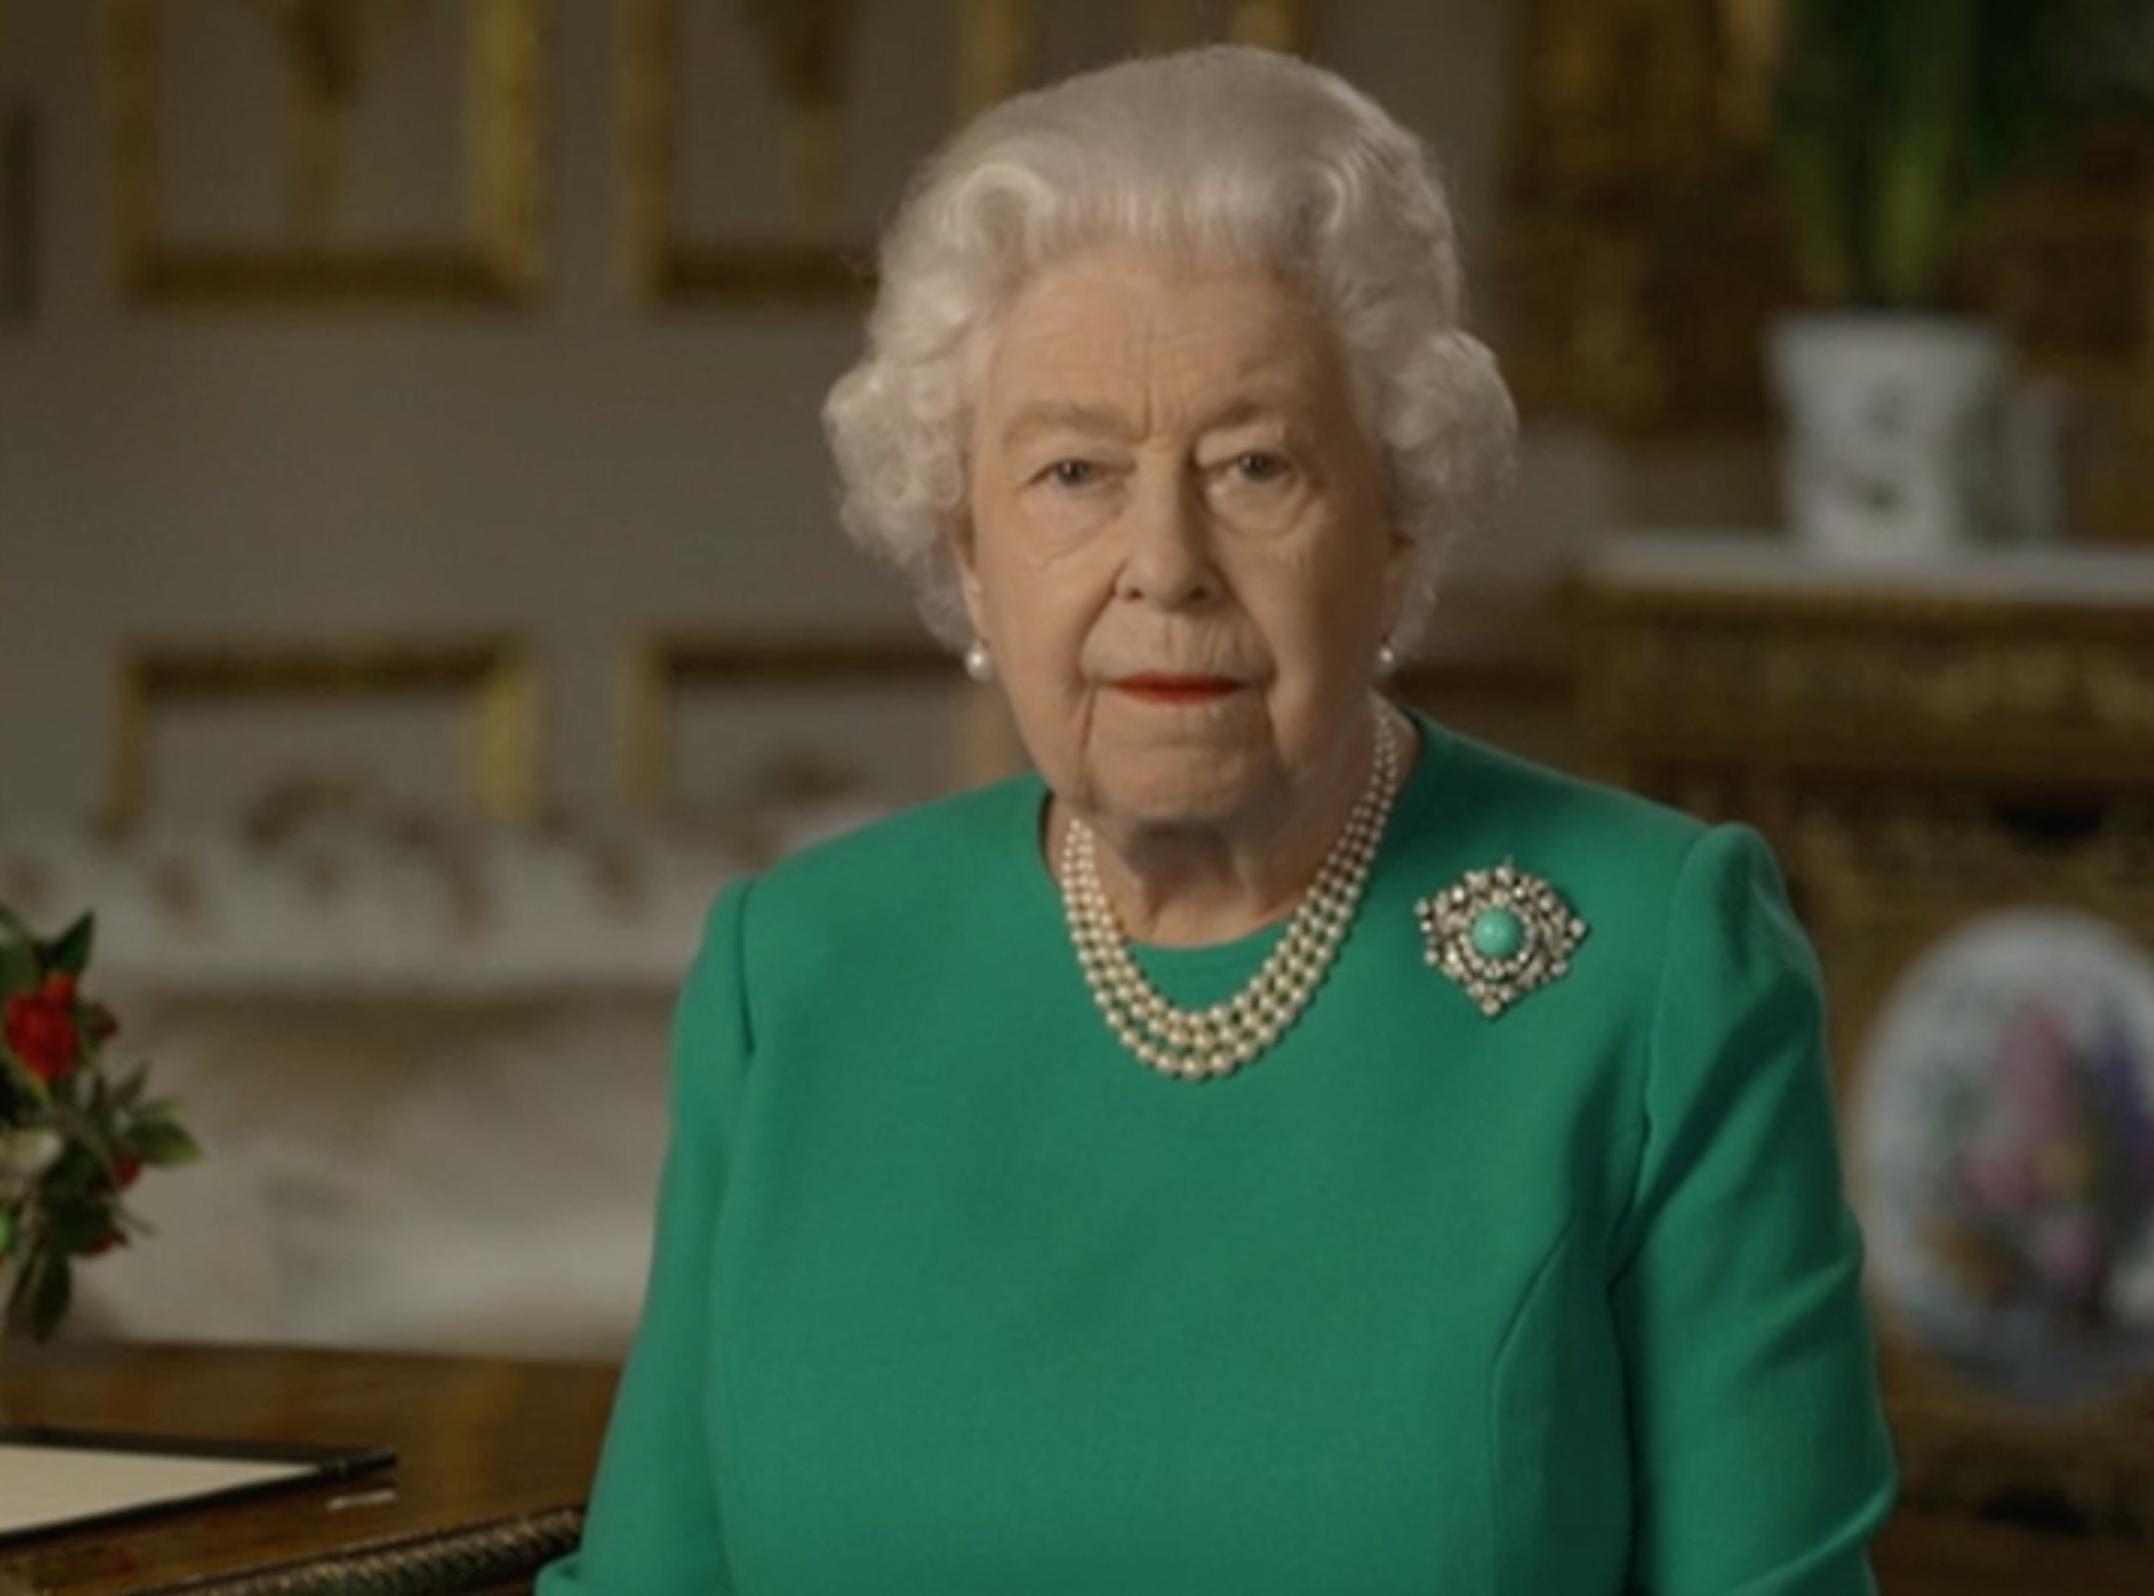 The Queen addressed the coronavirus pandemic on TV (Credit: BBC)